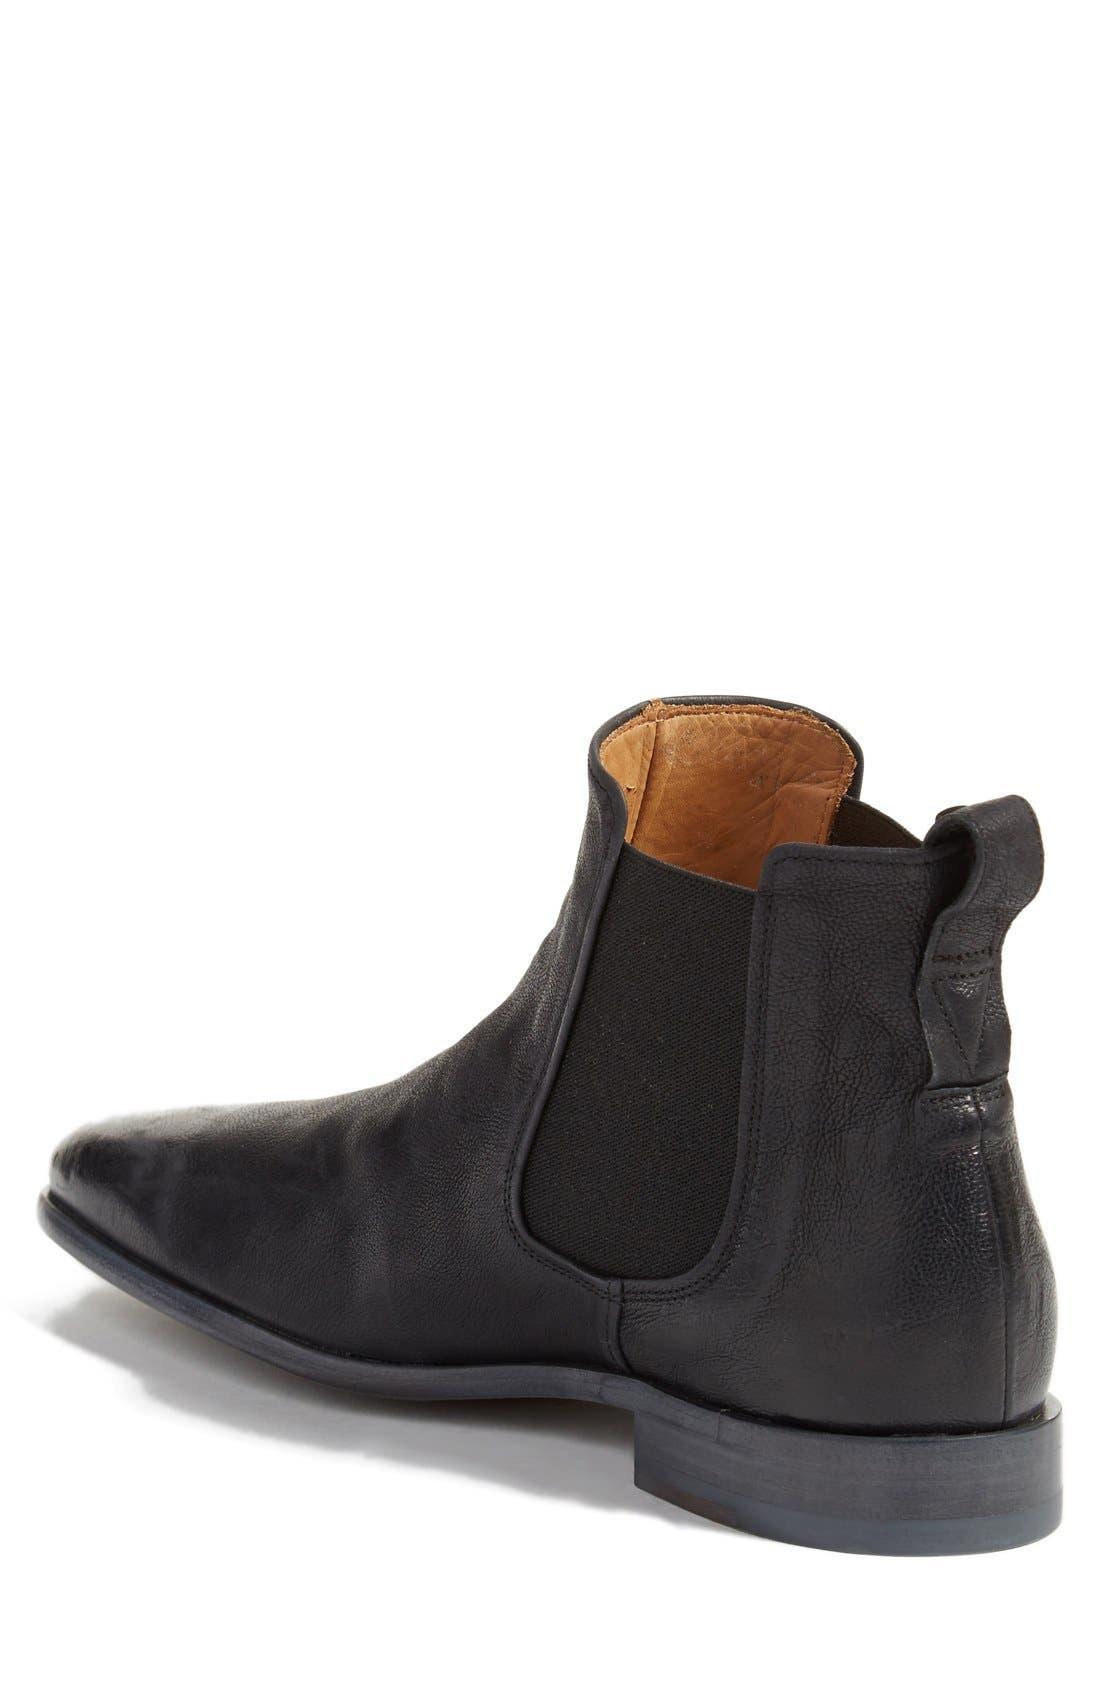 Arthur Chelsea Boot,                             Alternate thumbnail 2, color,                             Black Leather